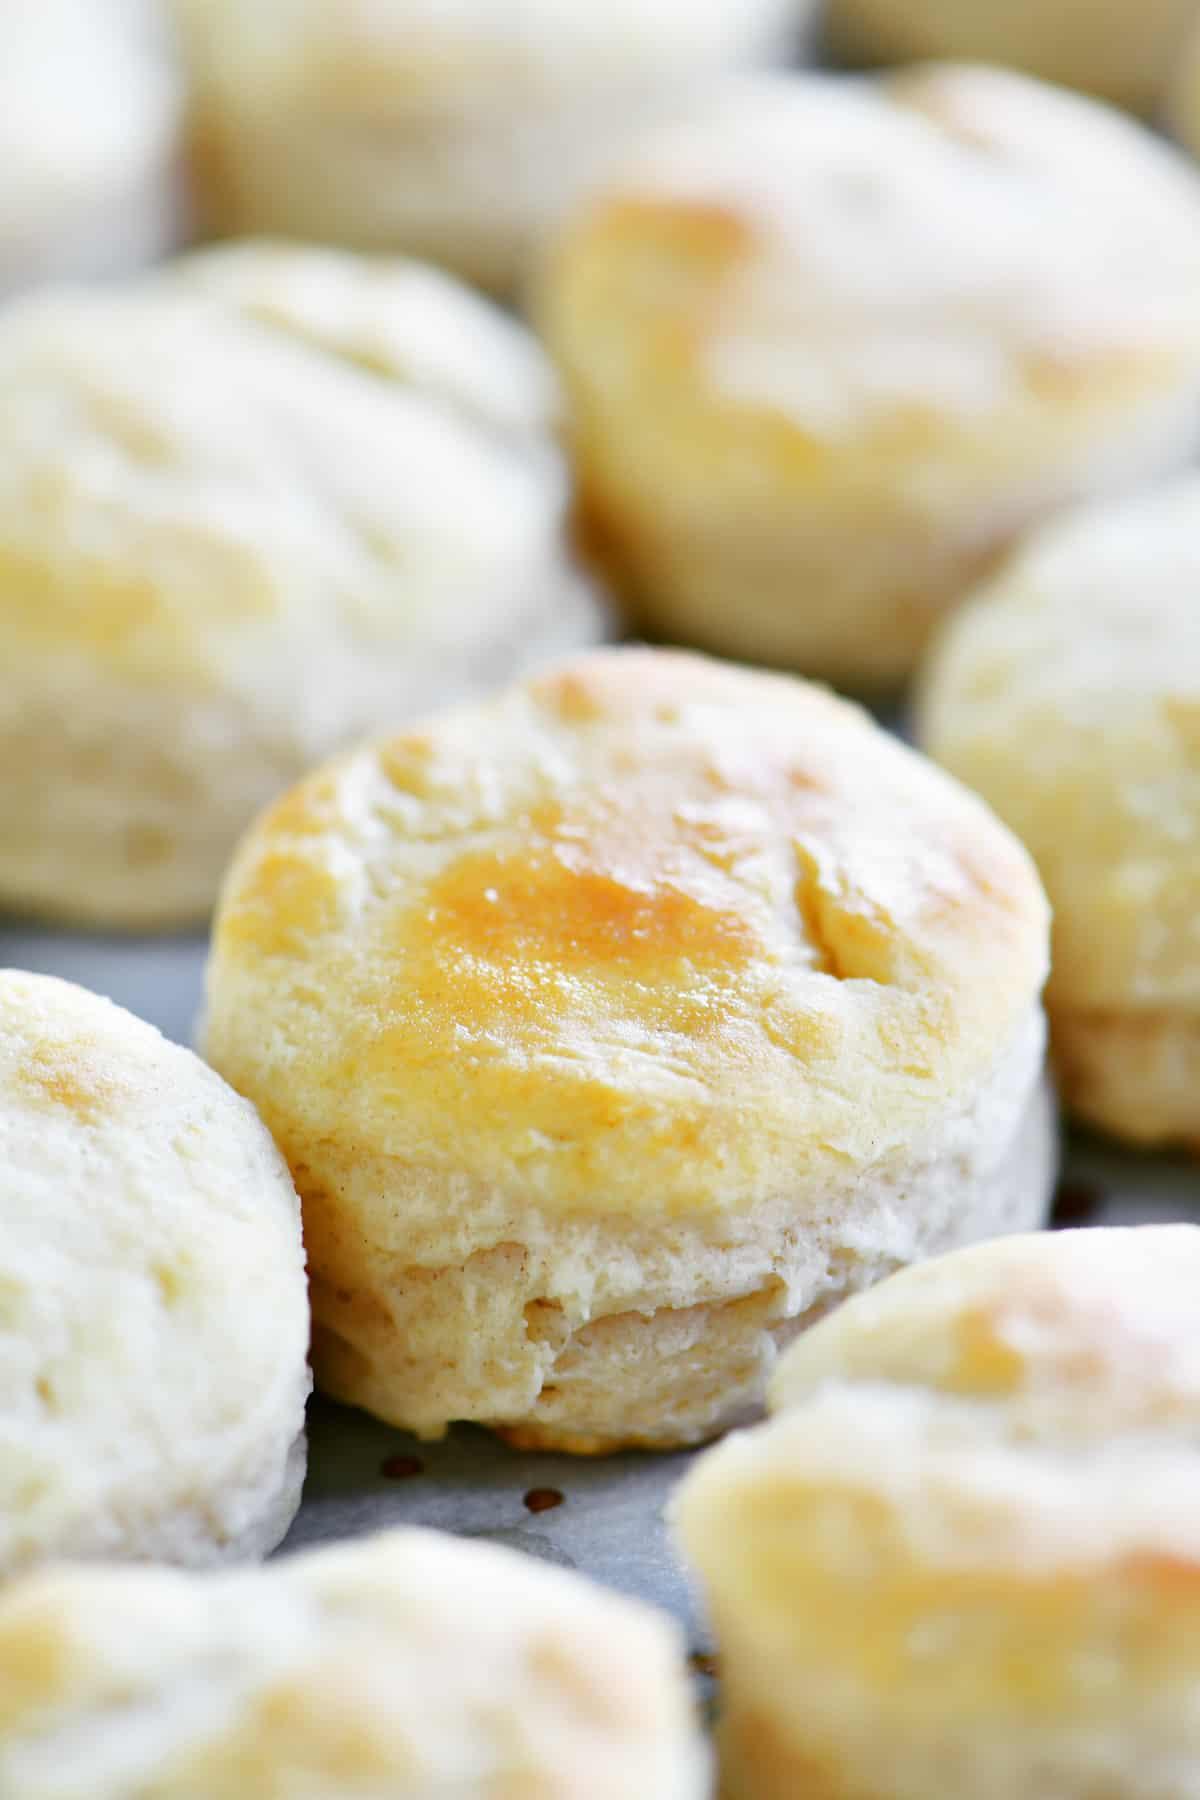 close up of a mini biscuit